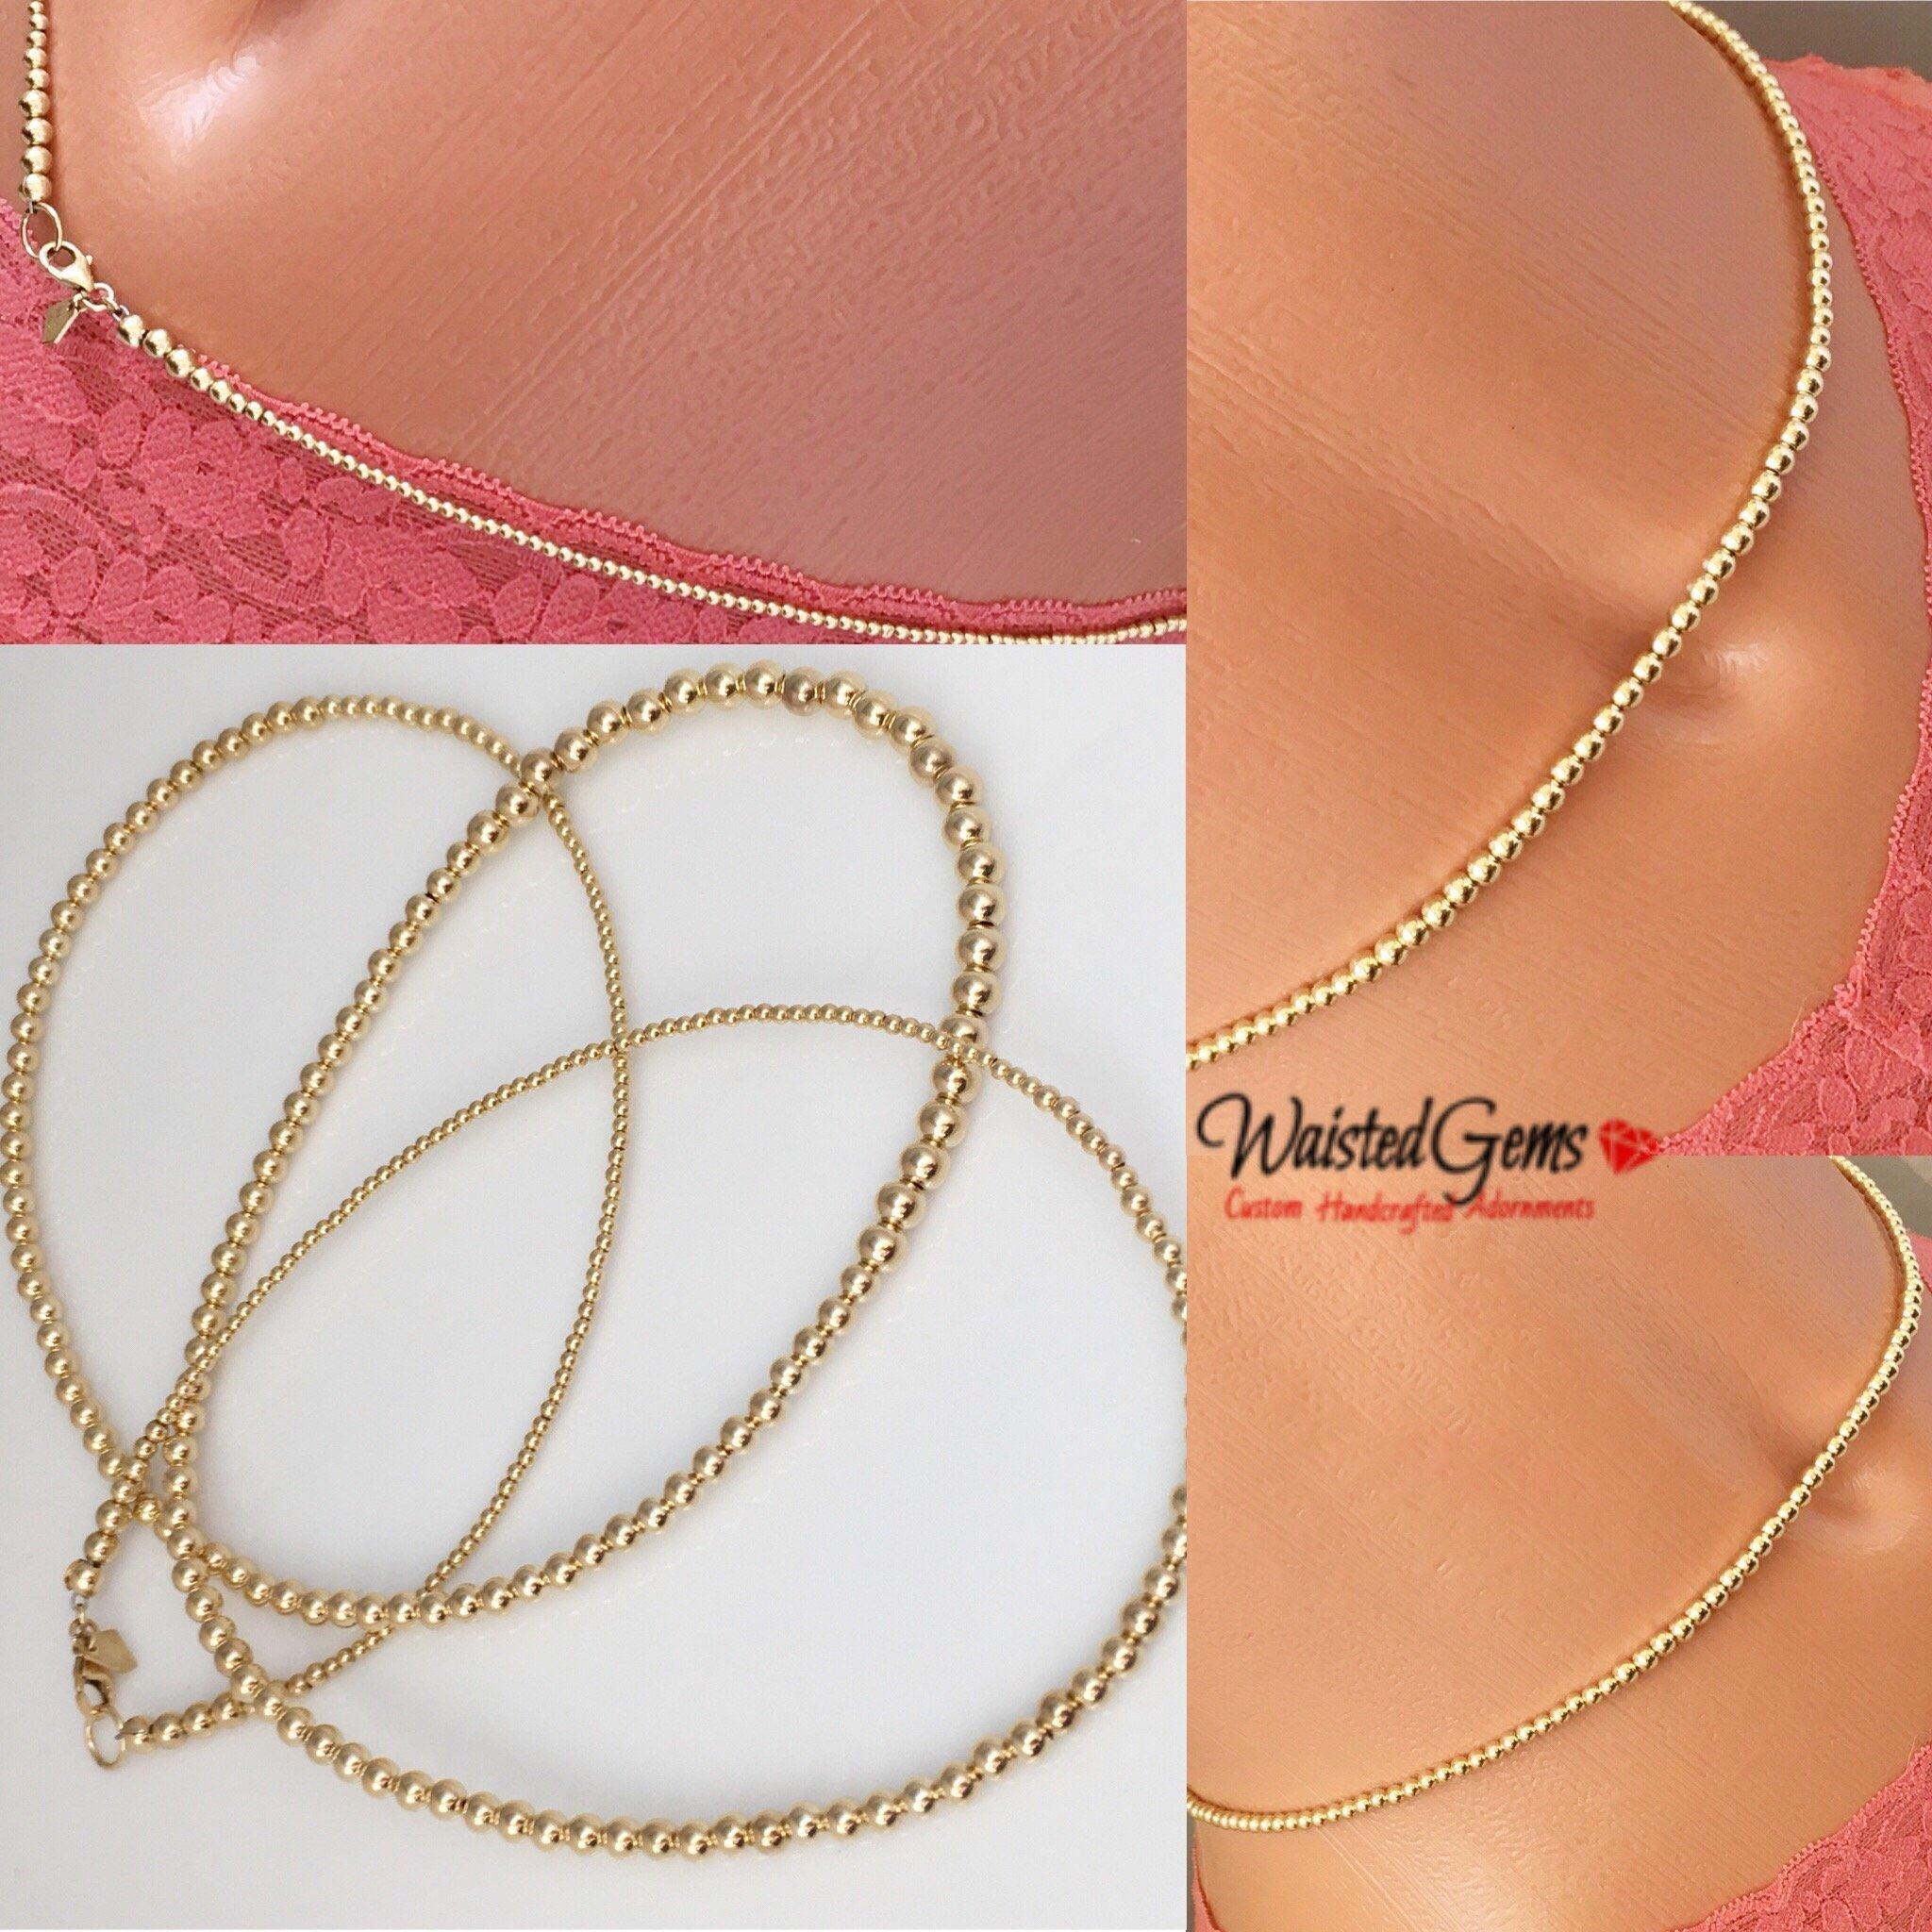 14k Gold Waist Beads, Wedding Gift, African Waist Beads, Waist Beads, Sale, 14k bead necklace, crop top, body chain, Gifts for her, African Jewelry, Summer Jewelry, Beach Wear,